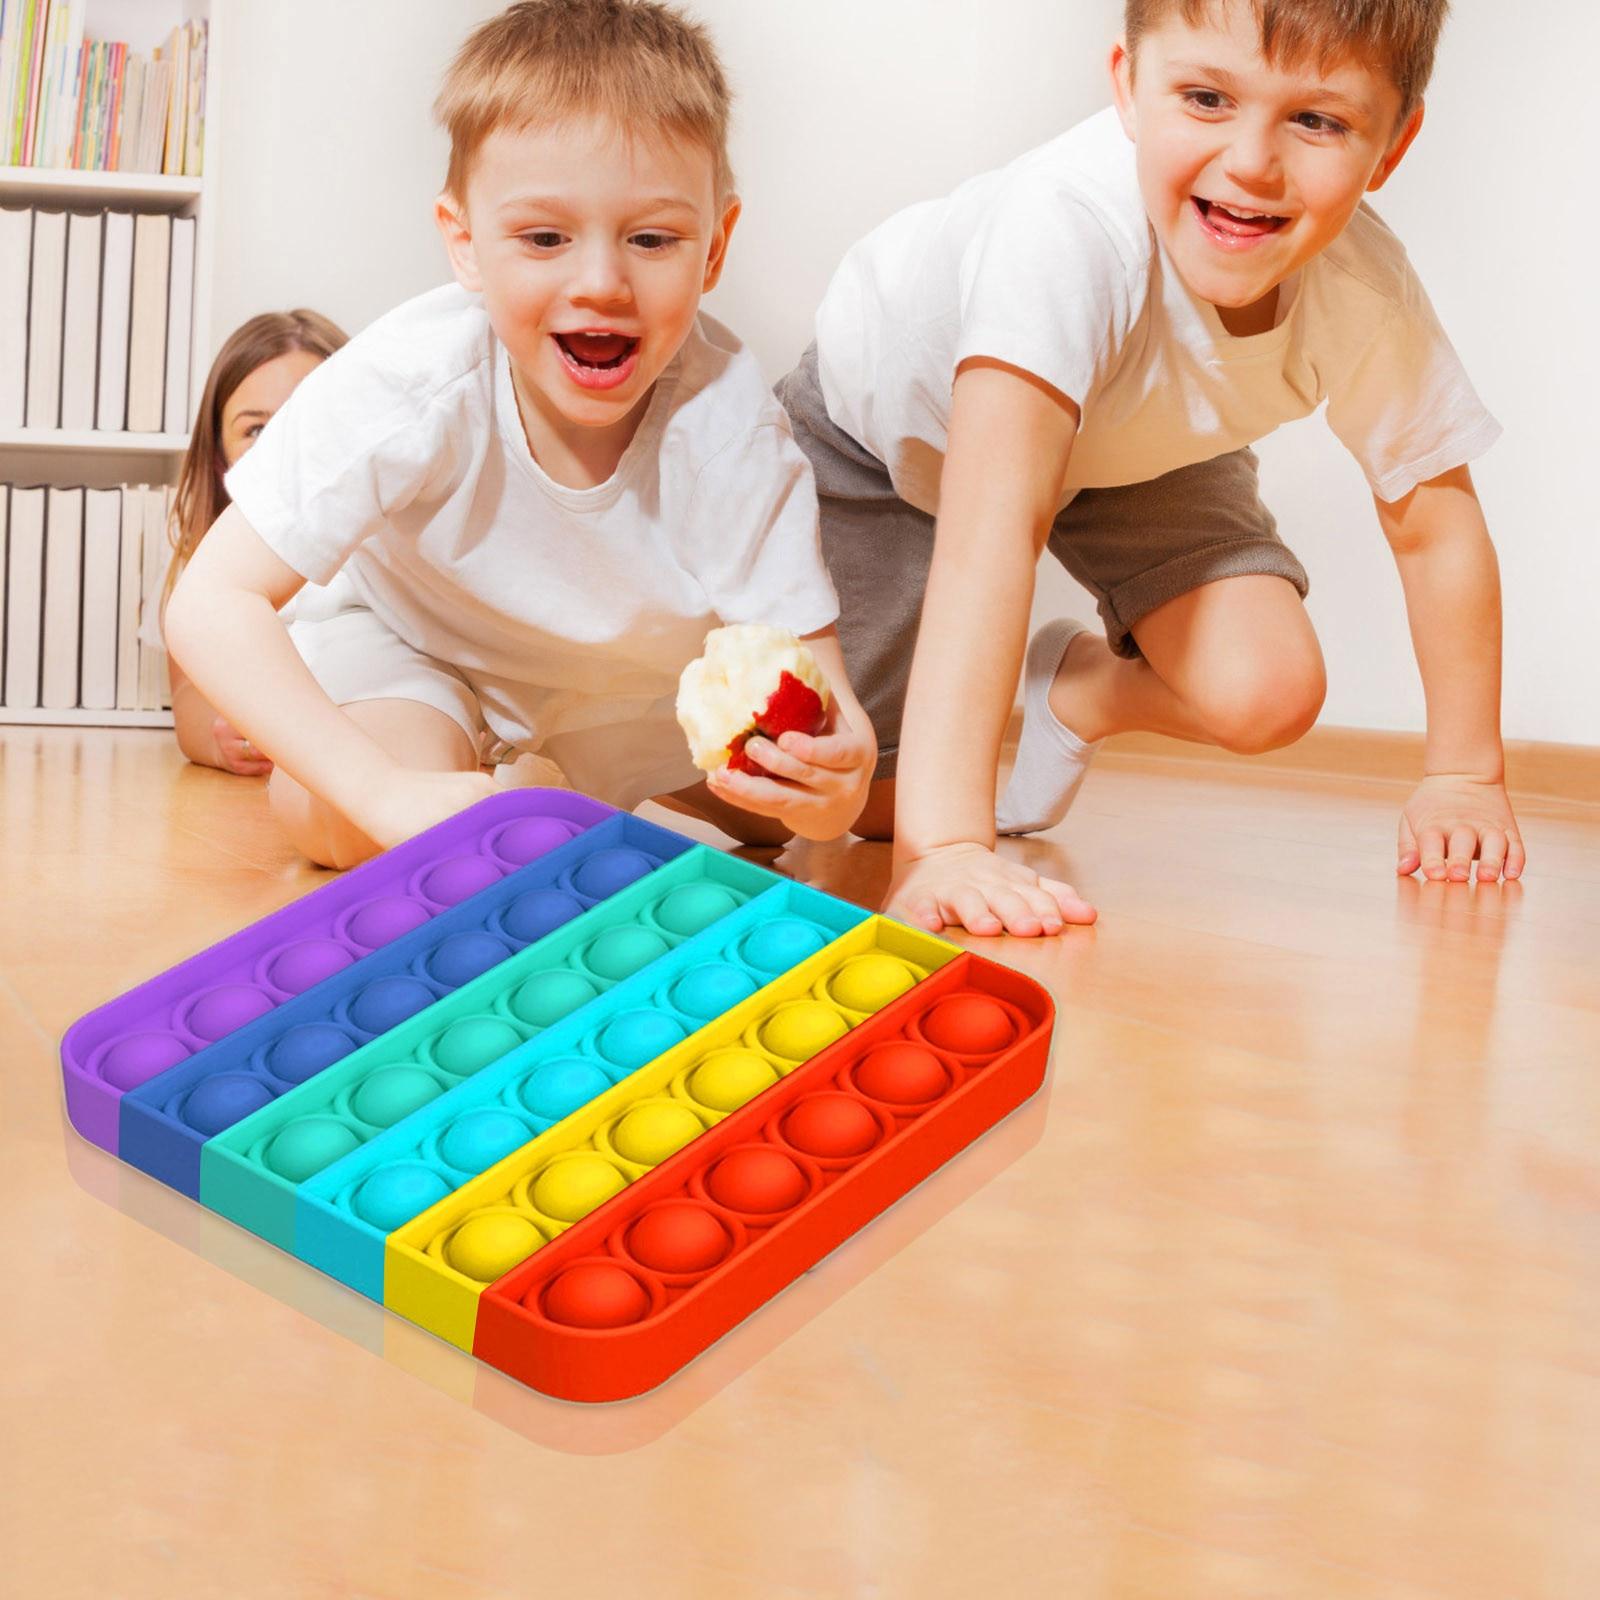 Toy Fidget-Toys Sensory-Toy Autism Needs-Stress Push Bubble Popit Special Kids Simple Dimple img5